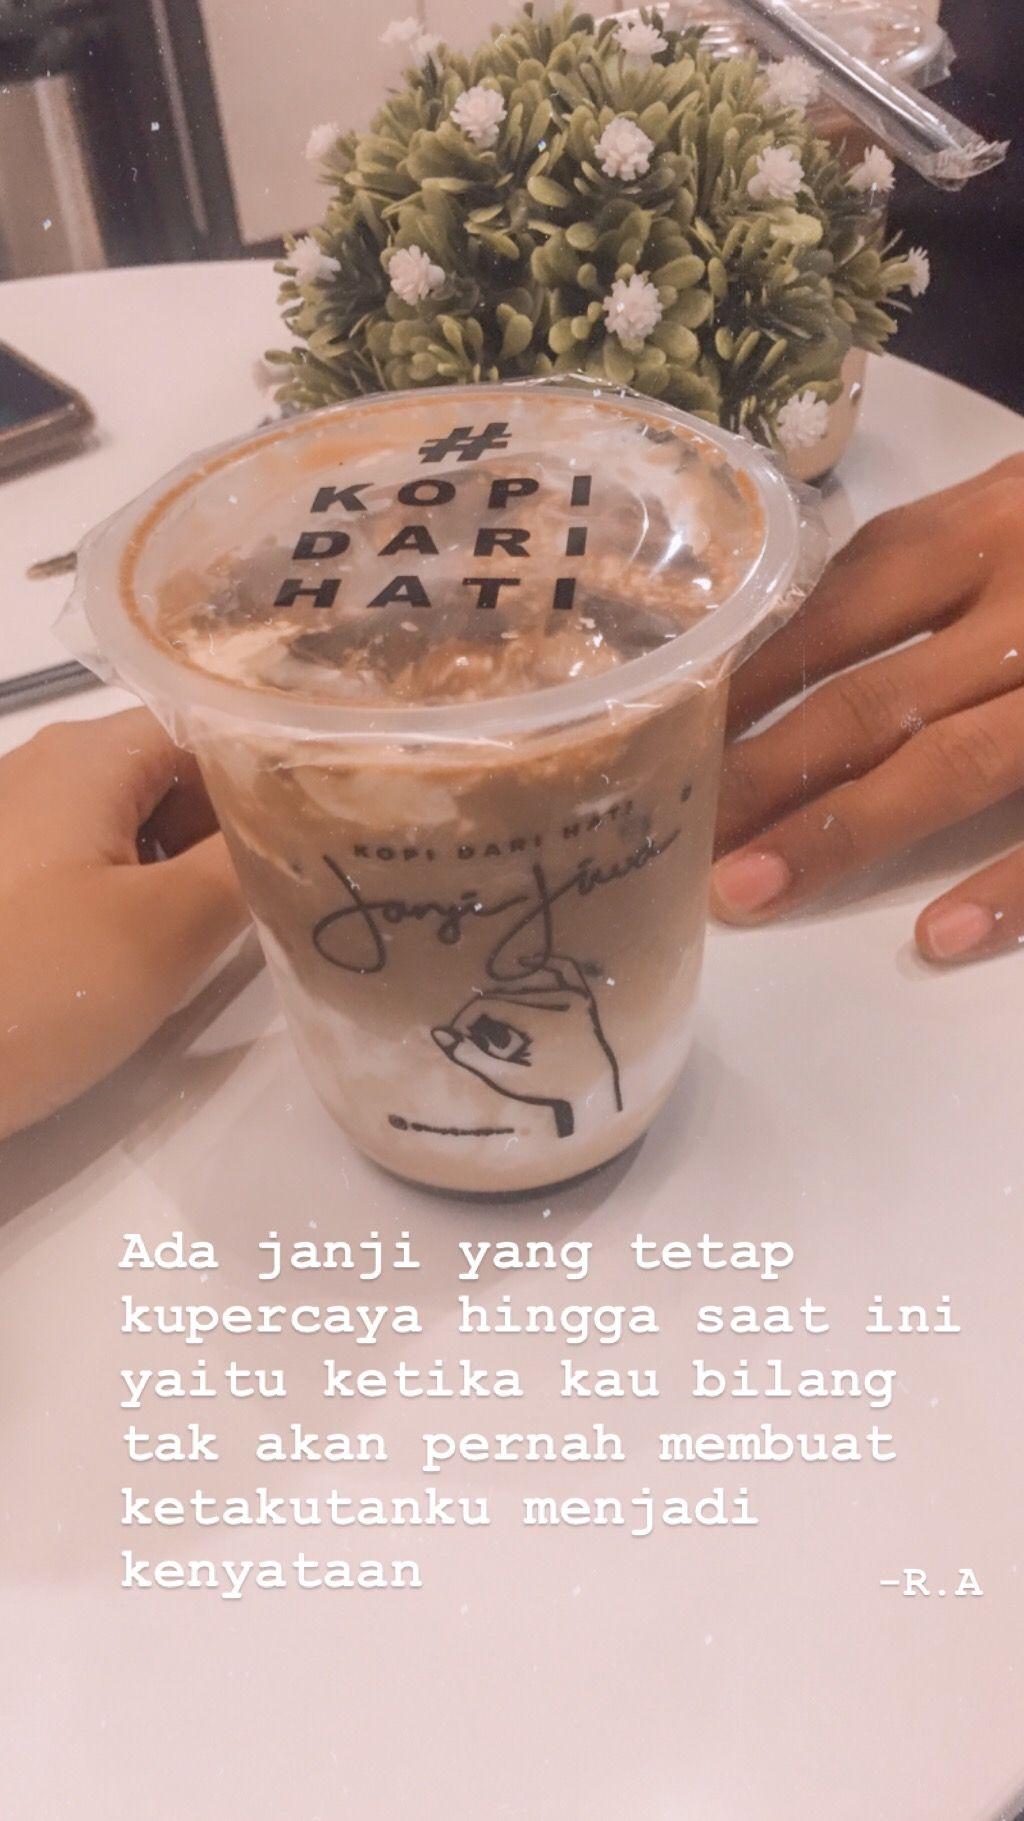 Janjijiwa Kopi Coffee Quotesindonesia Galau Sedih Dengan